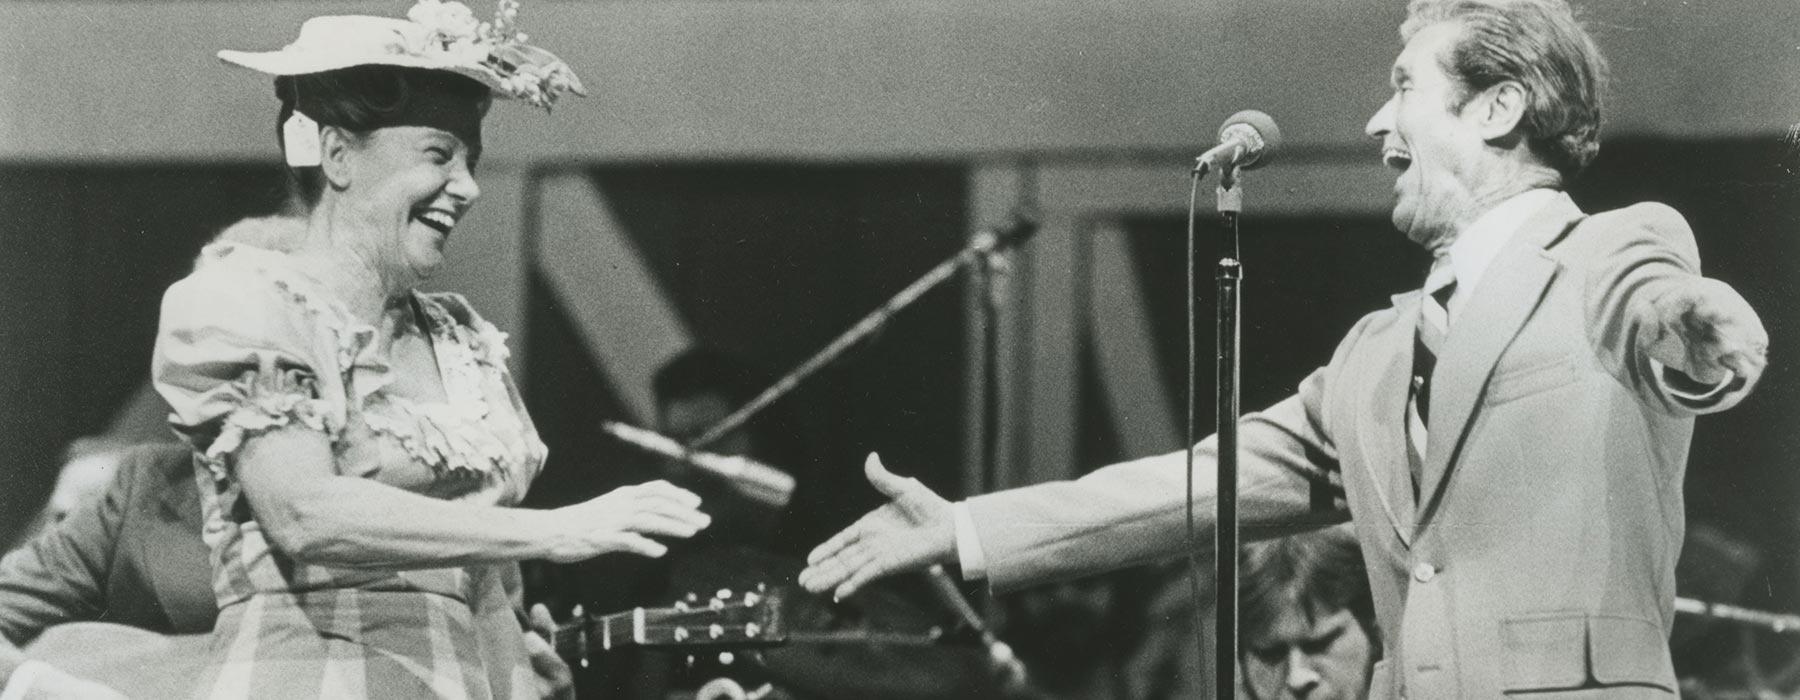 Minnie Pearl & Roy Acuff Ken Burns Country Music on NPT